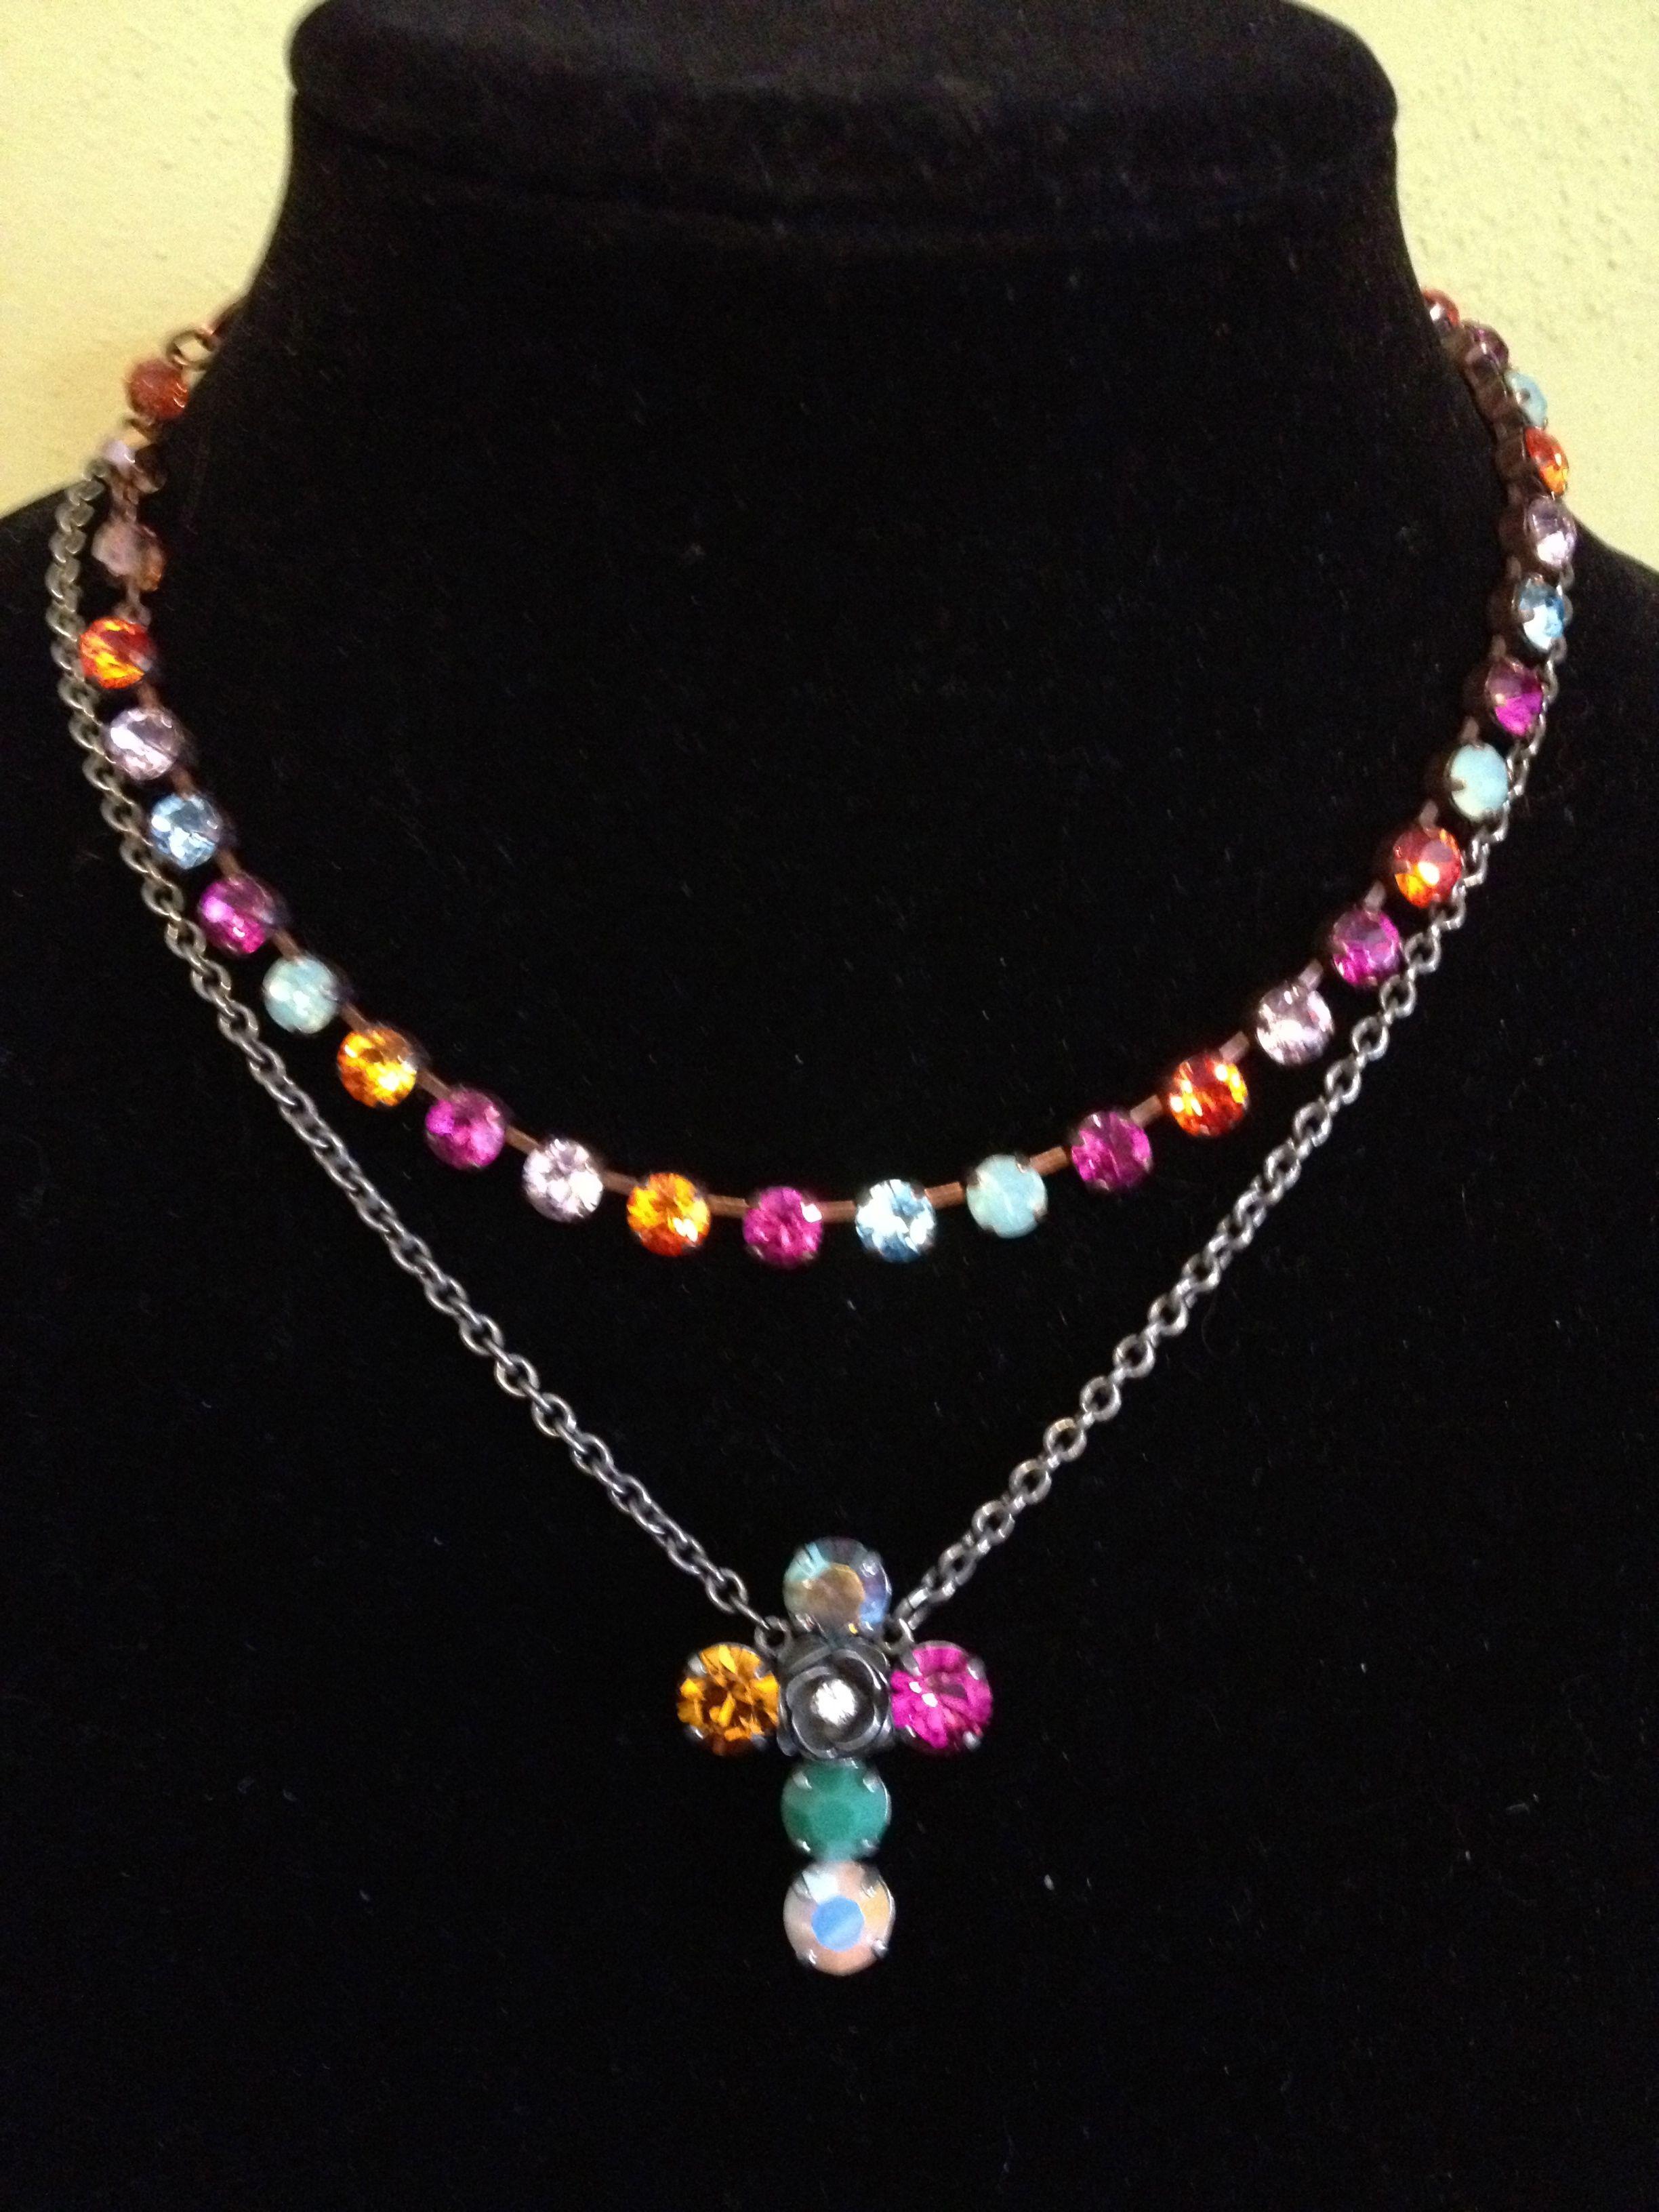 Sabika look necklace - Sabika S12 Dolce Vita London Choker S13 Vintage T Shirt Cross Necklace Karen